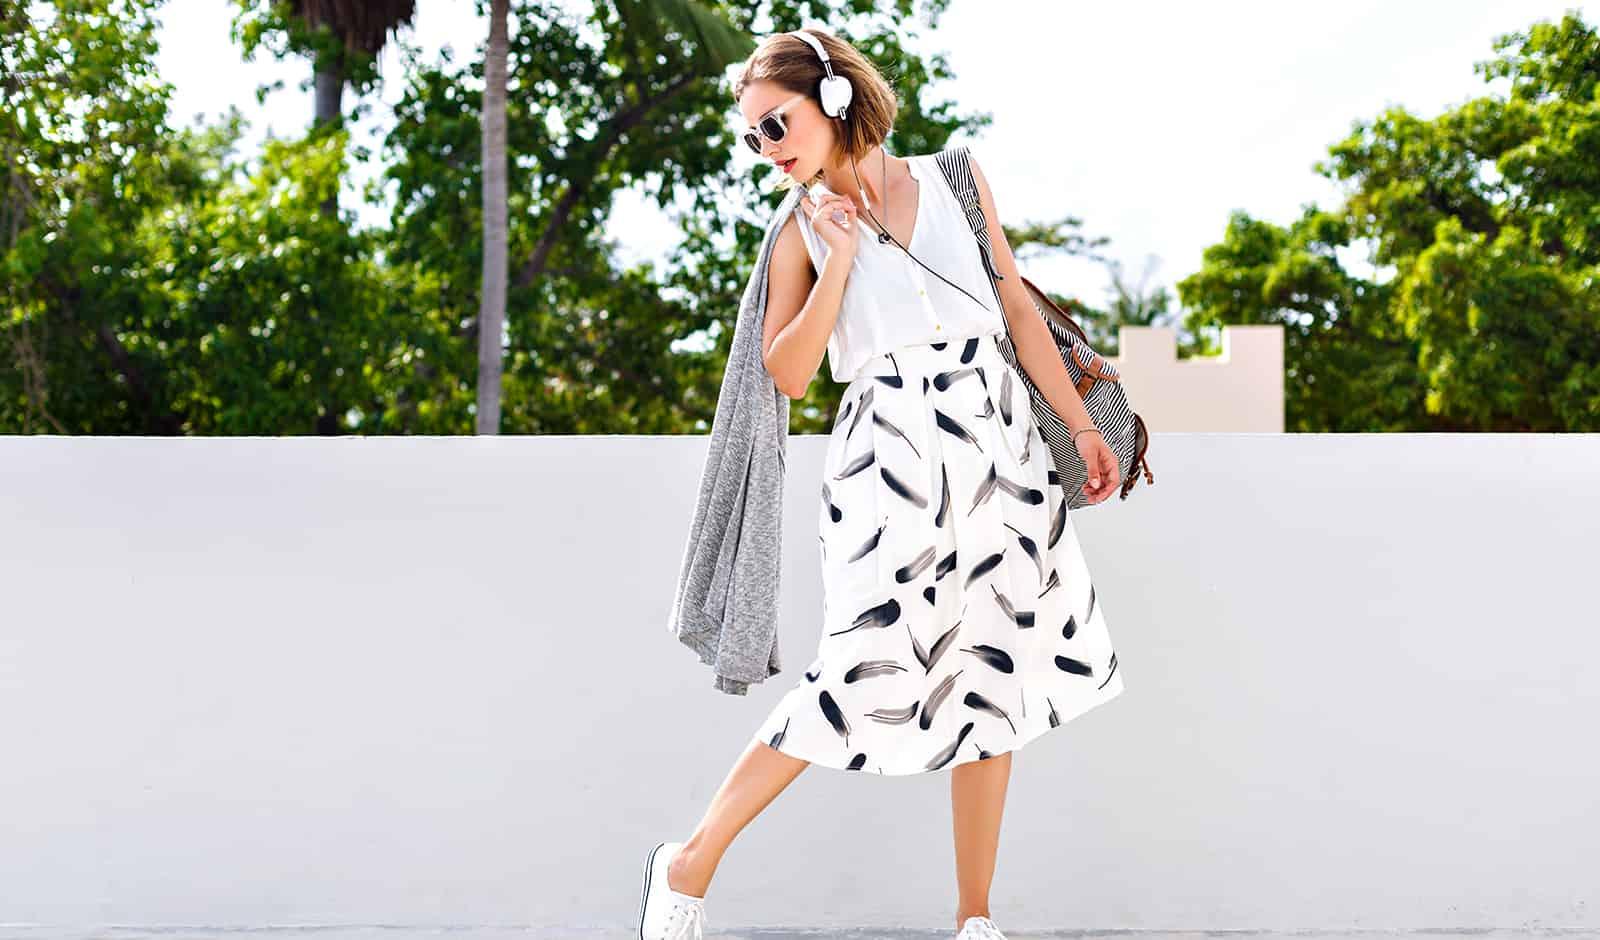 cardigan-styling-tricks-main-image-viva-glam